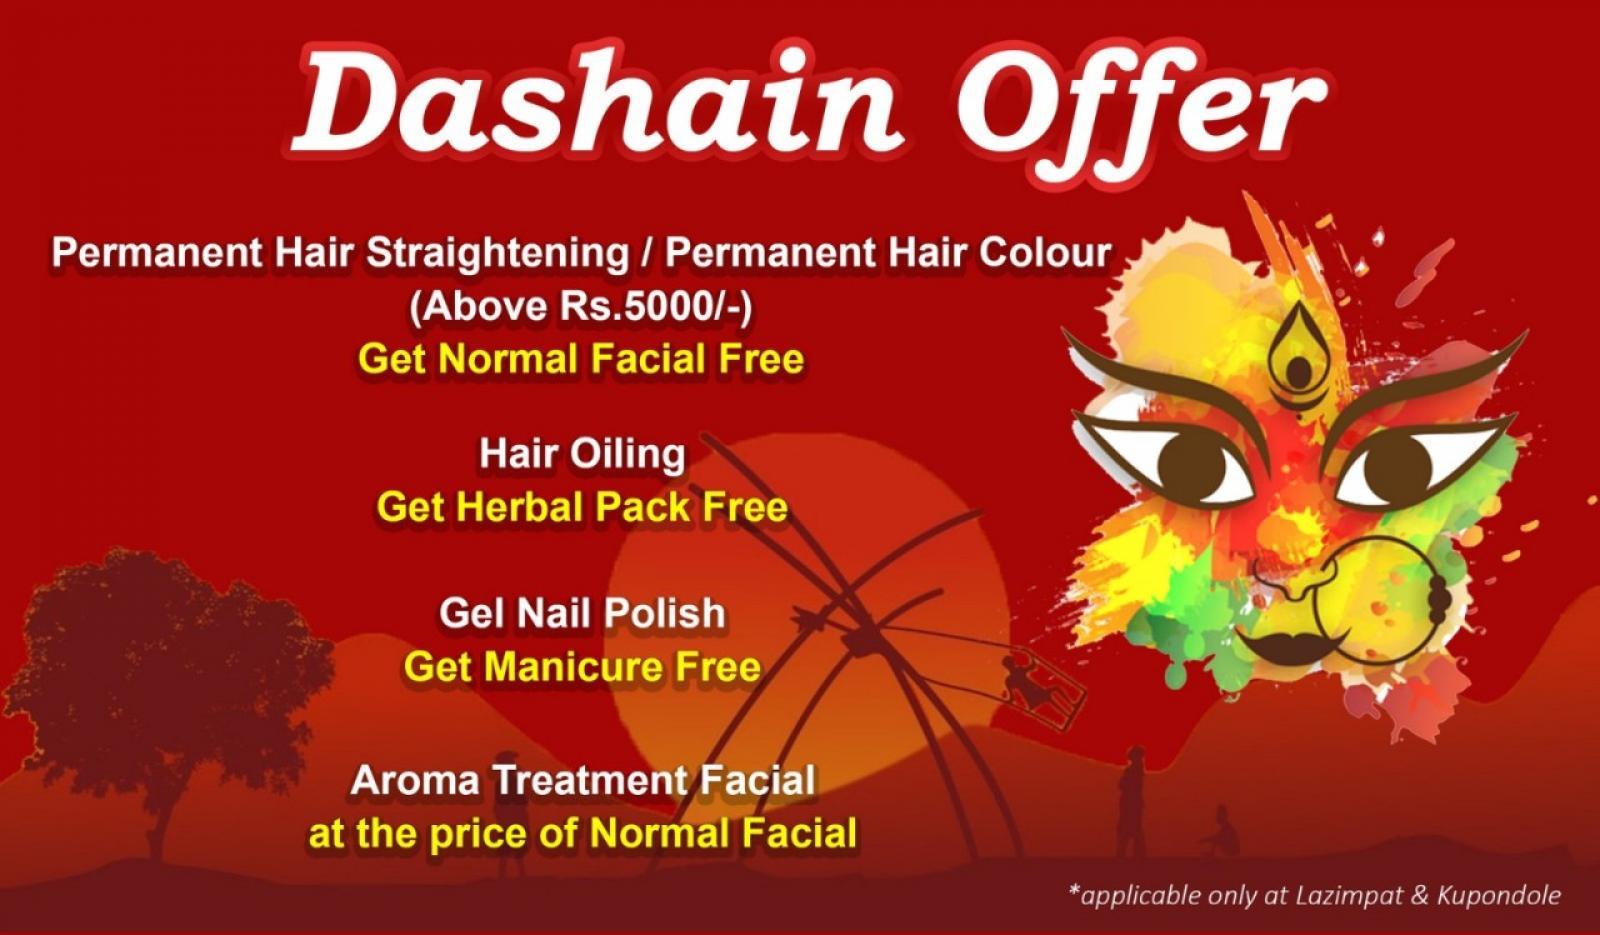 Dashain Offer (Lazimpat and Kupondole)